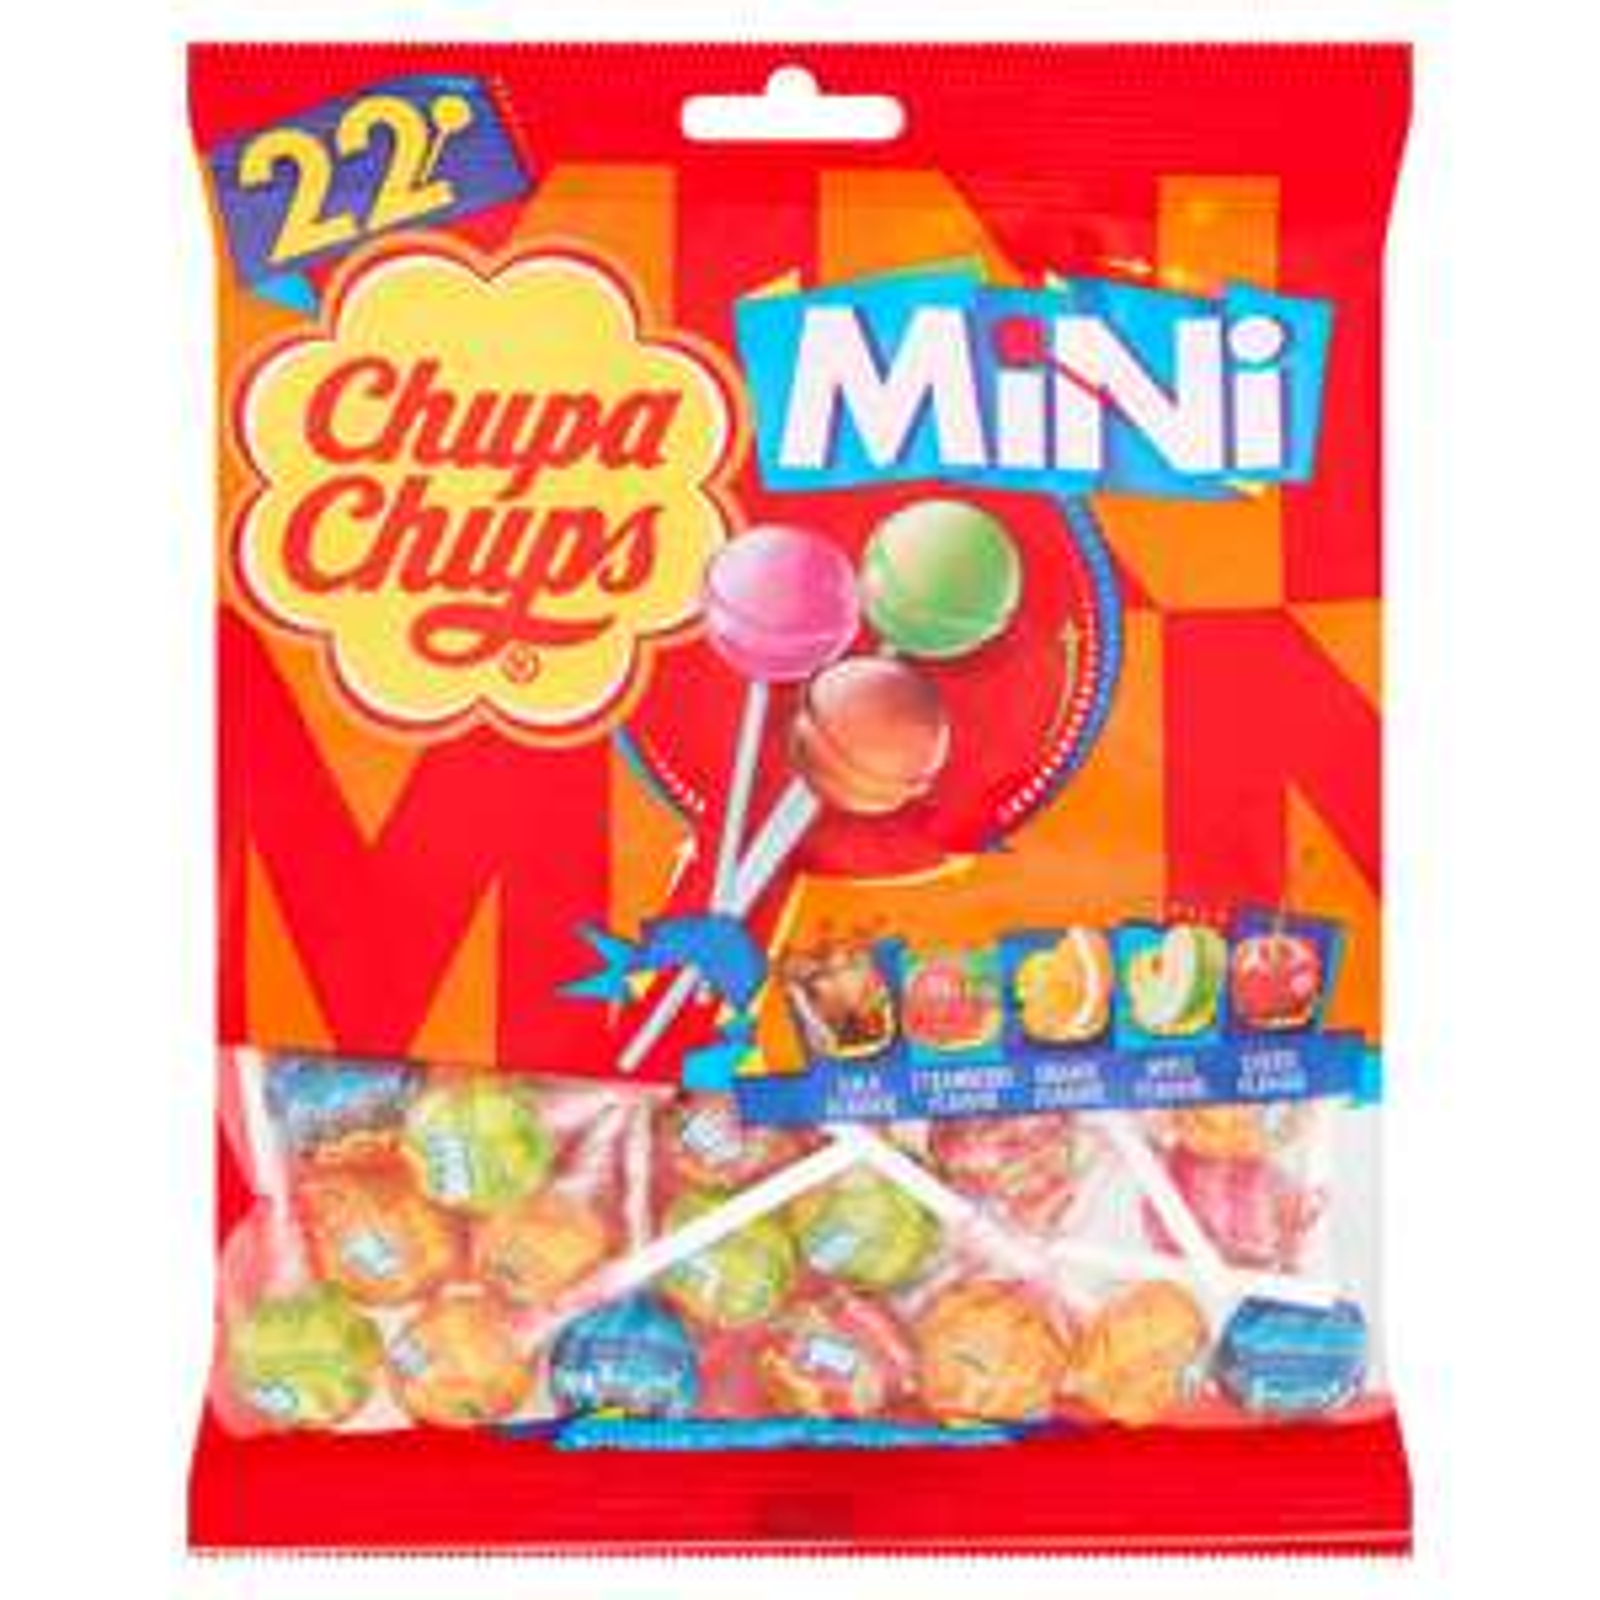 Chupa Chups 22 Assorted Flavour Mini Lollipops (132g) £1 @ Iceland